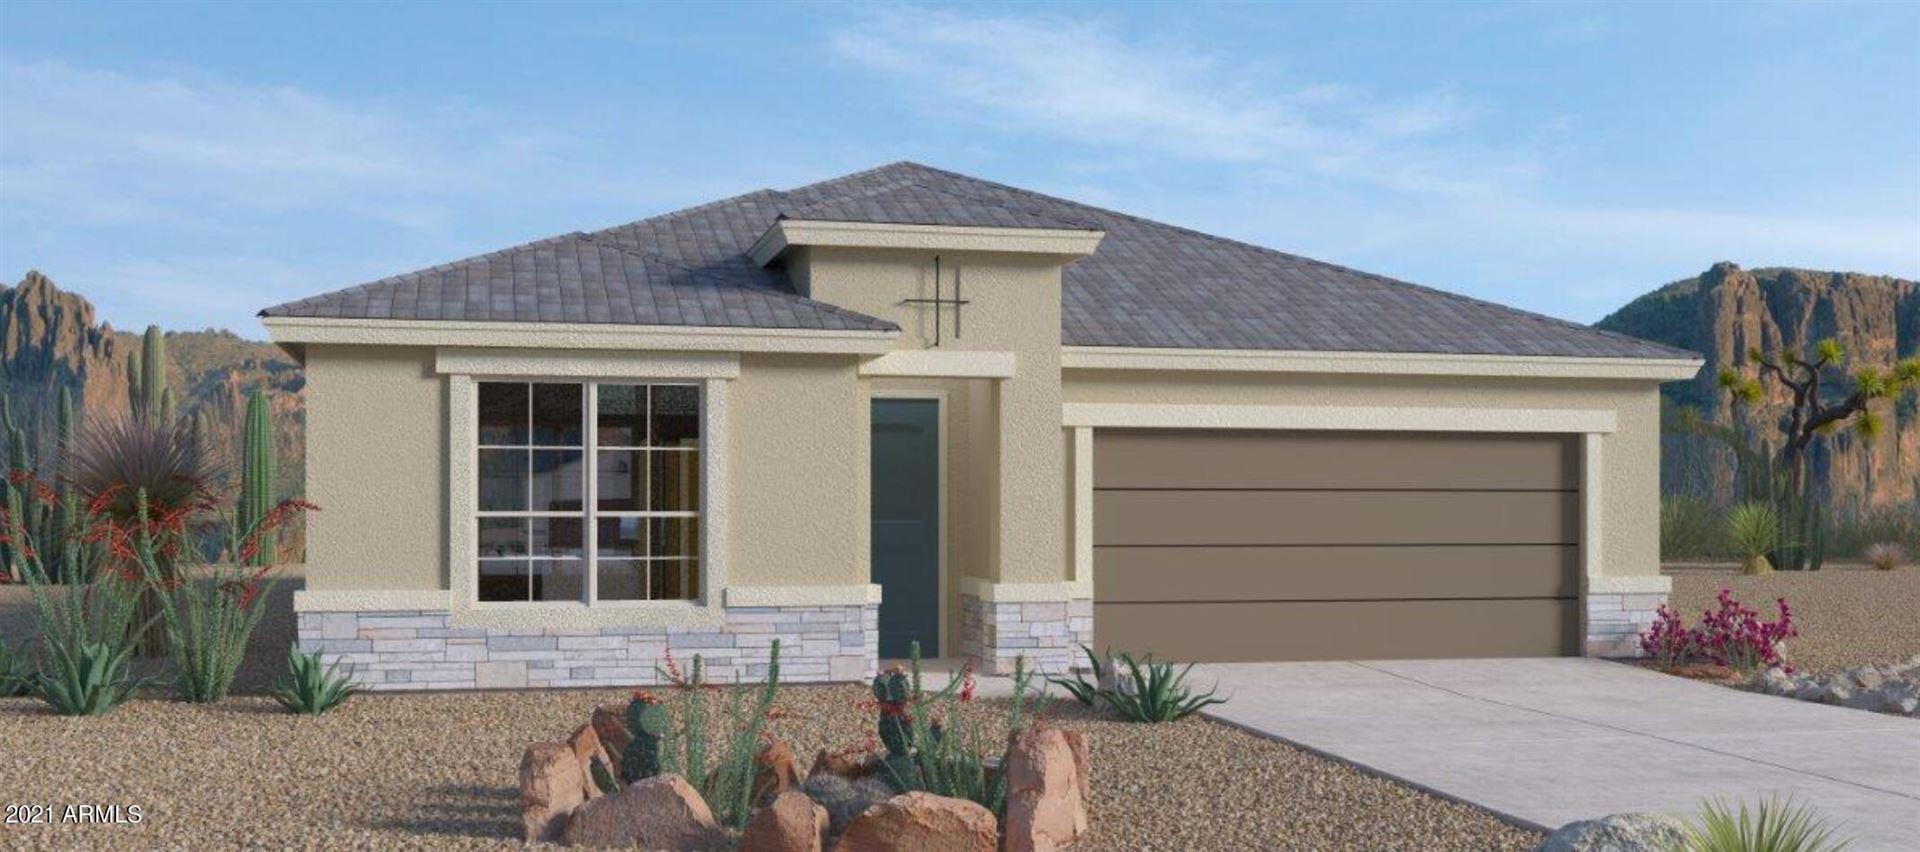 Photo of 44401 W PALO ABETO Drive, Maricopa, AZ 85138 (MLS # 6295827)